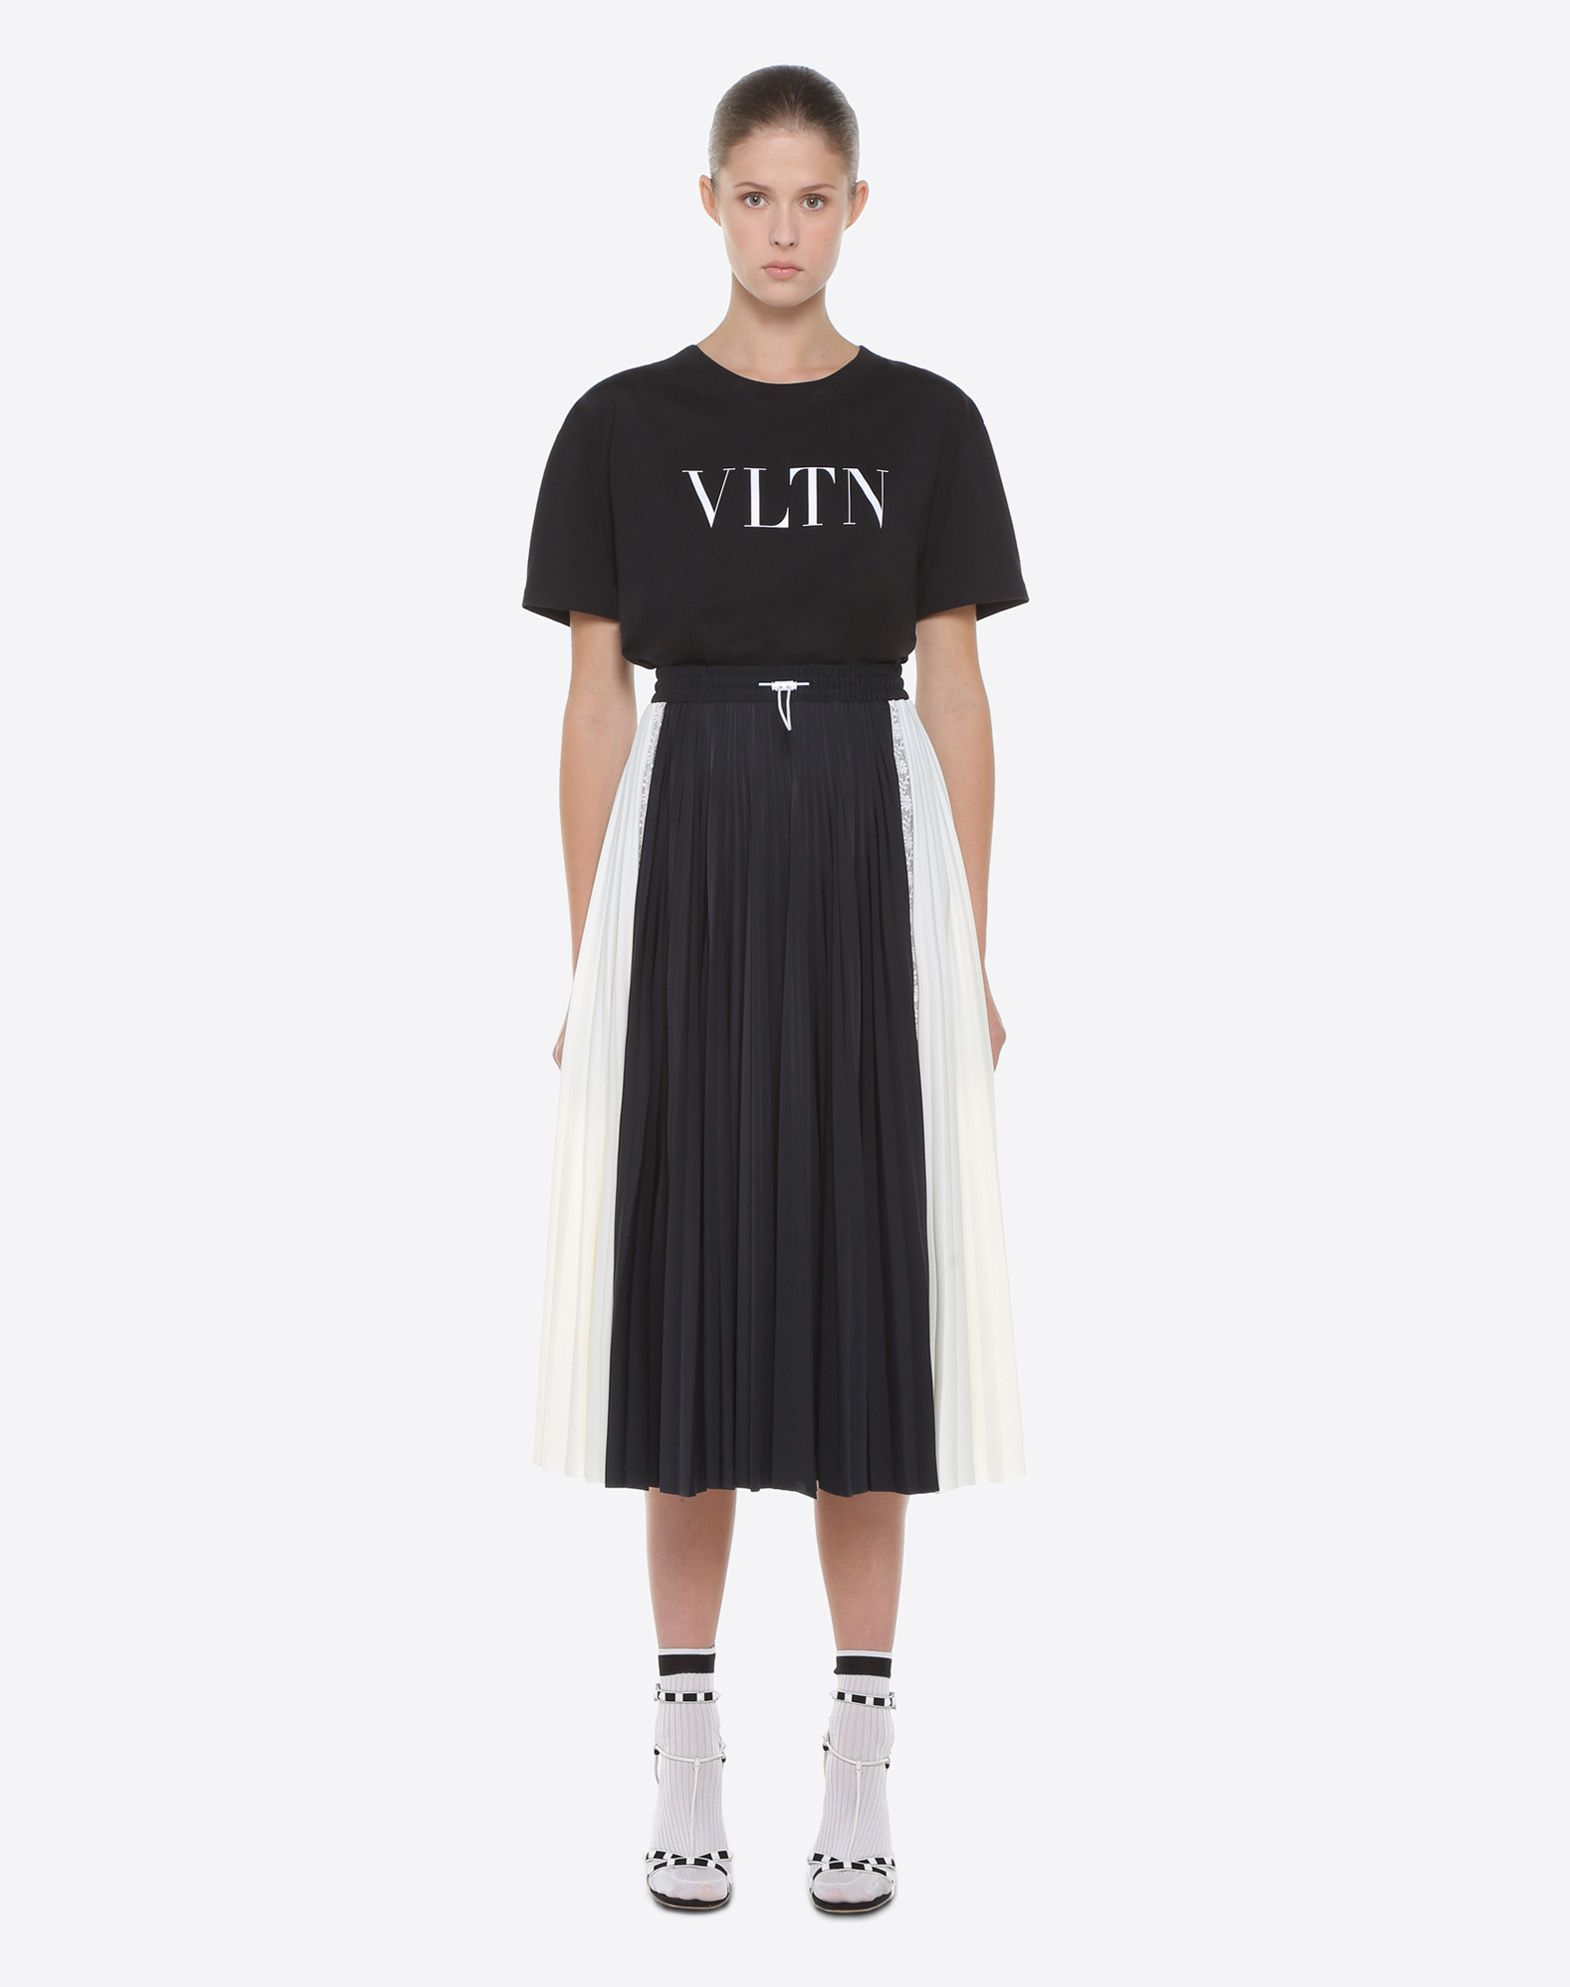 VALENTINO VLTN t-shirt T-shirt D r